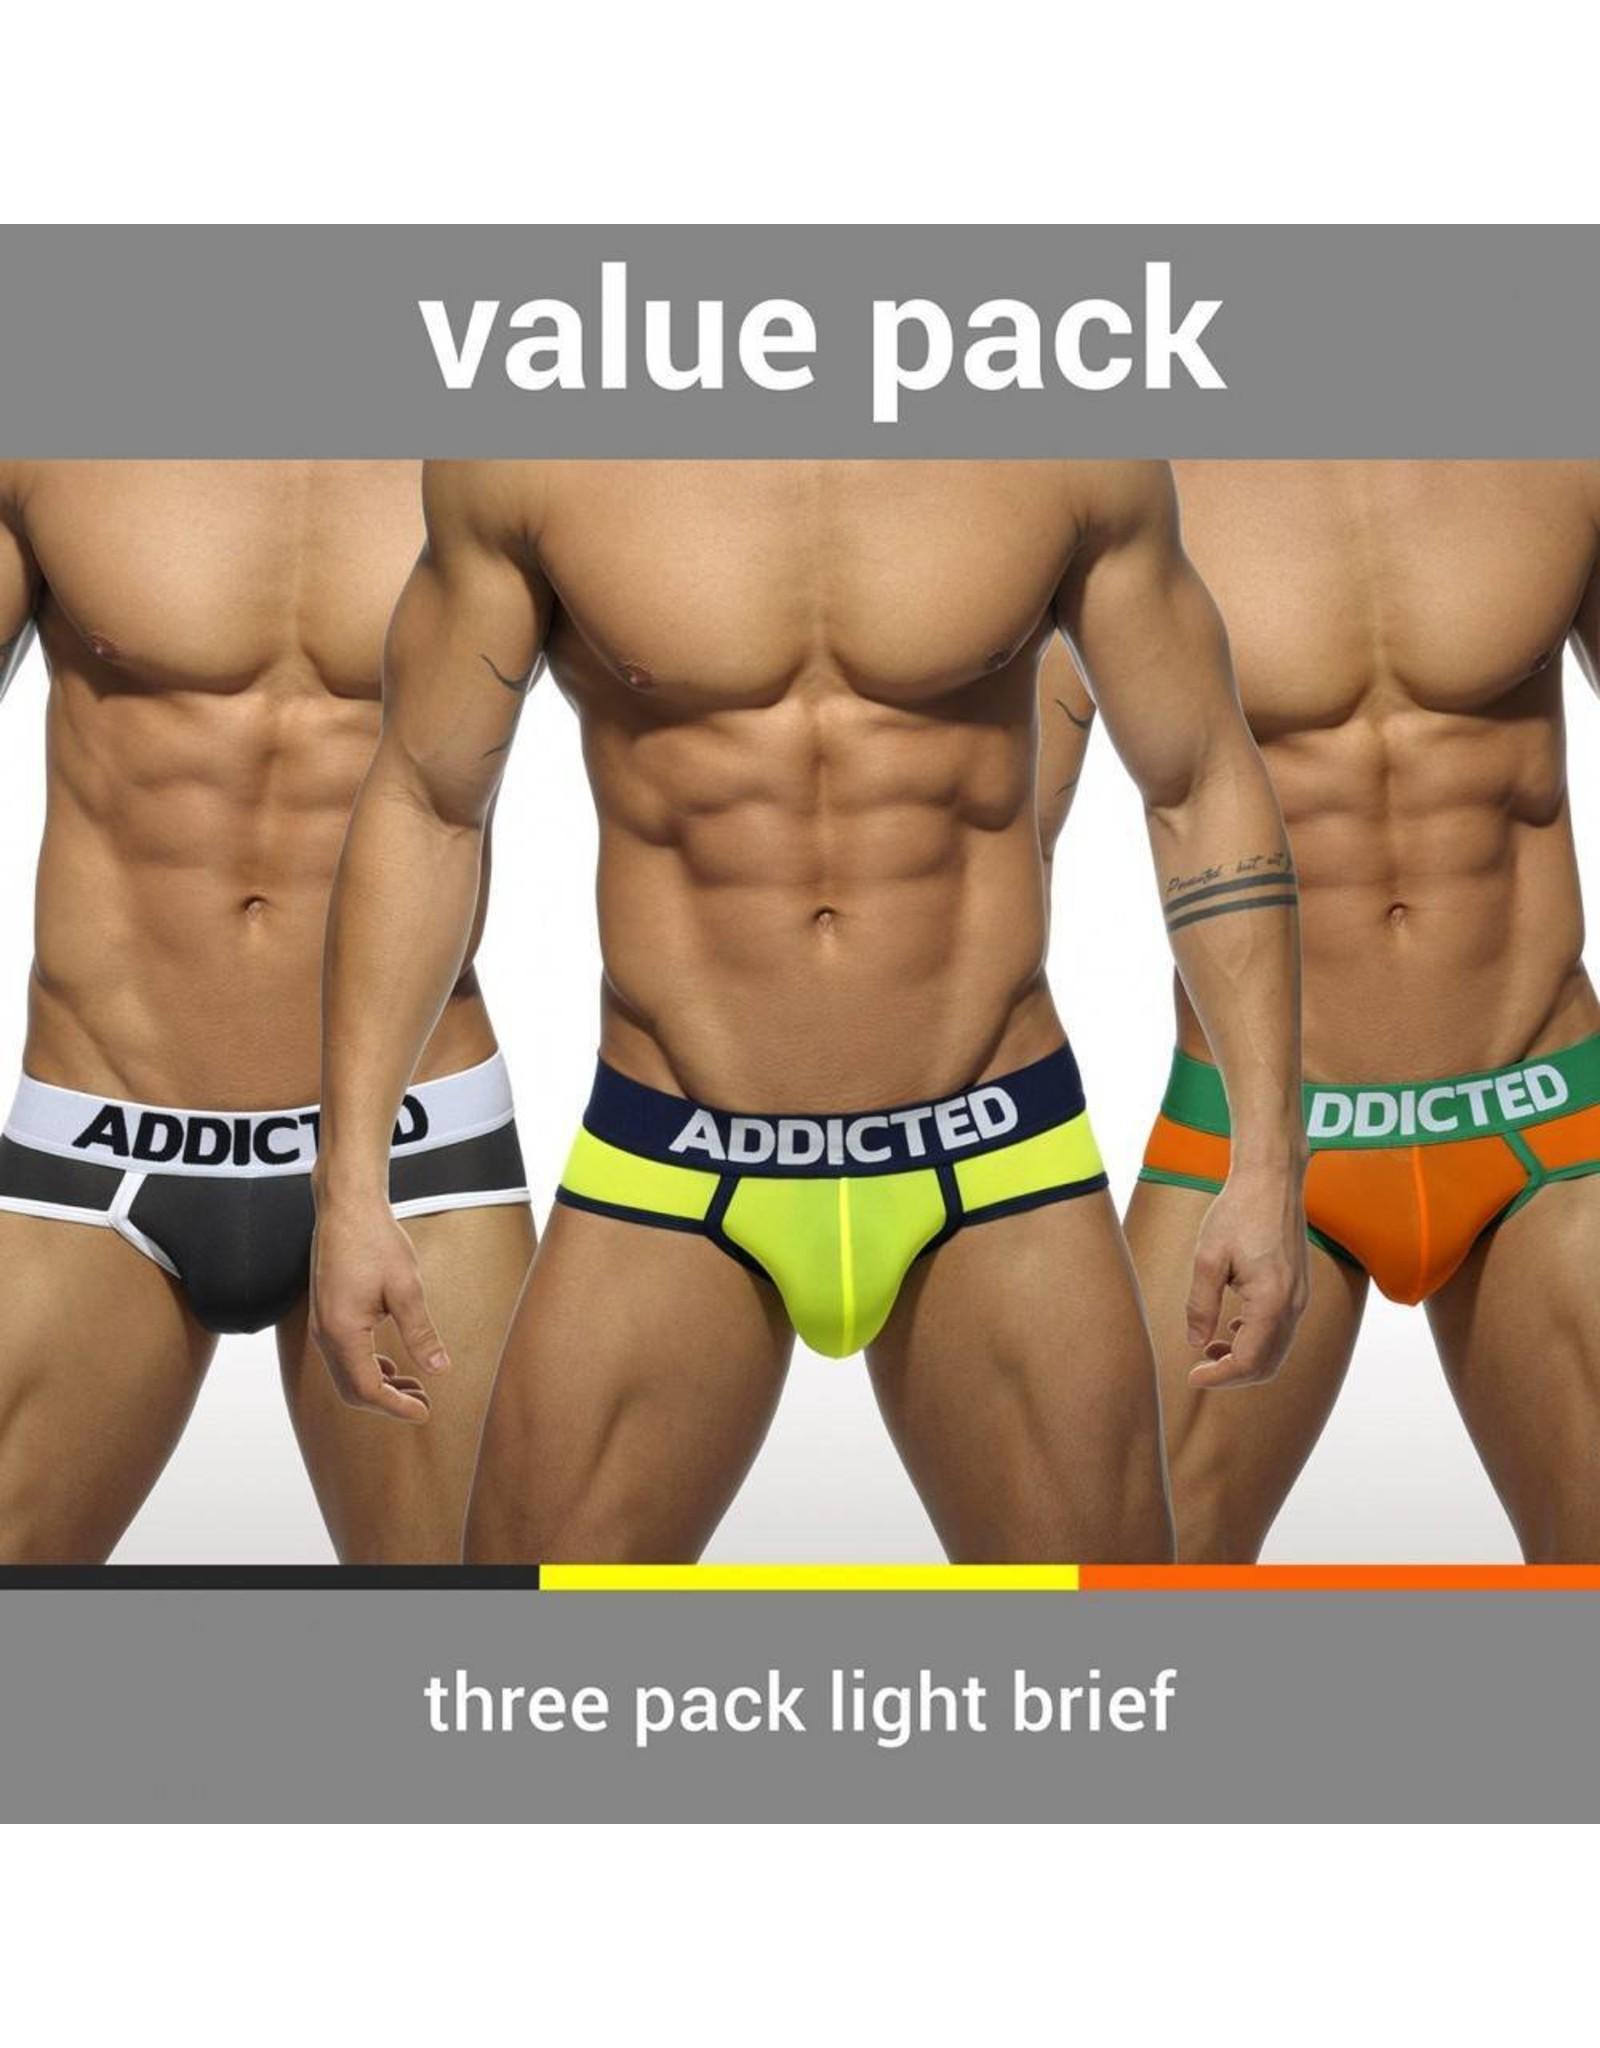 Addicted ADDICTED Three Pack Light Brief